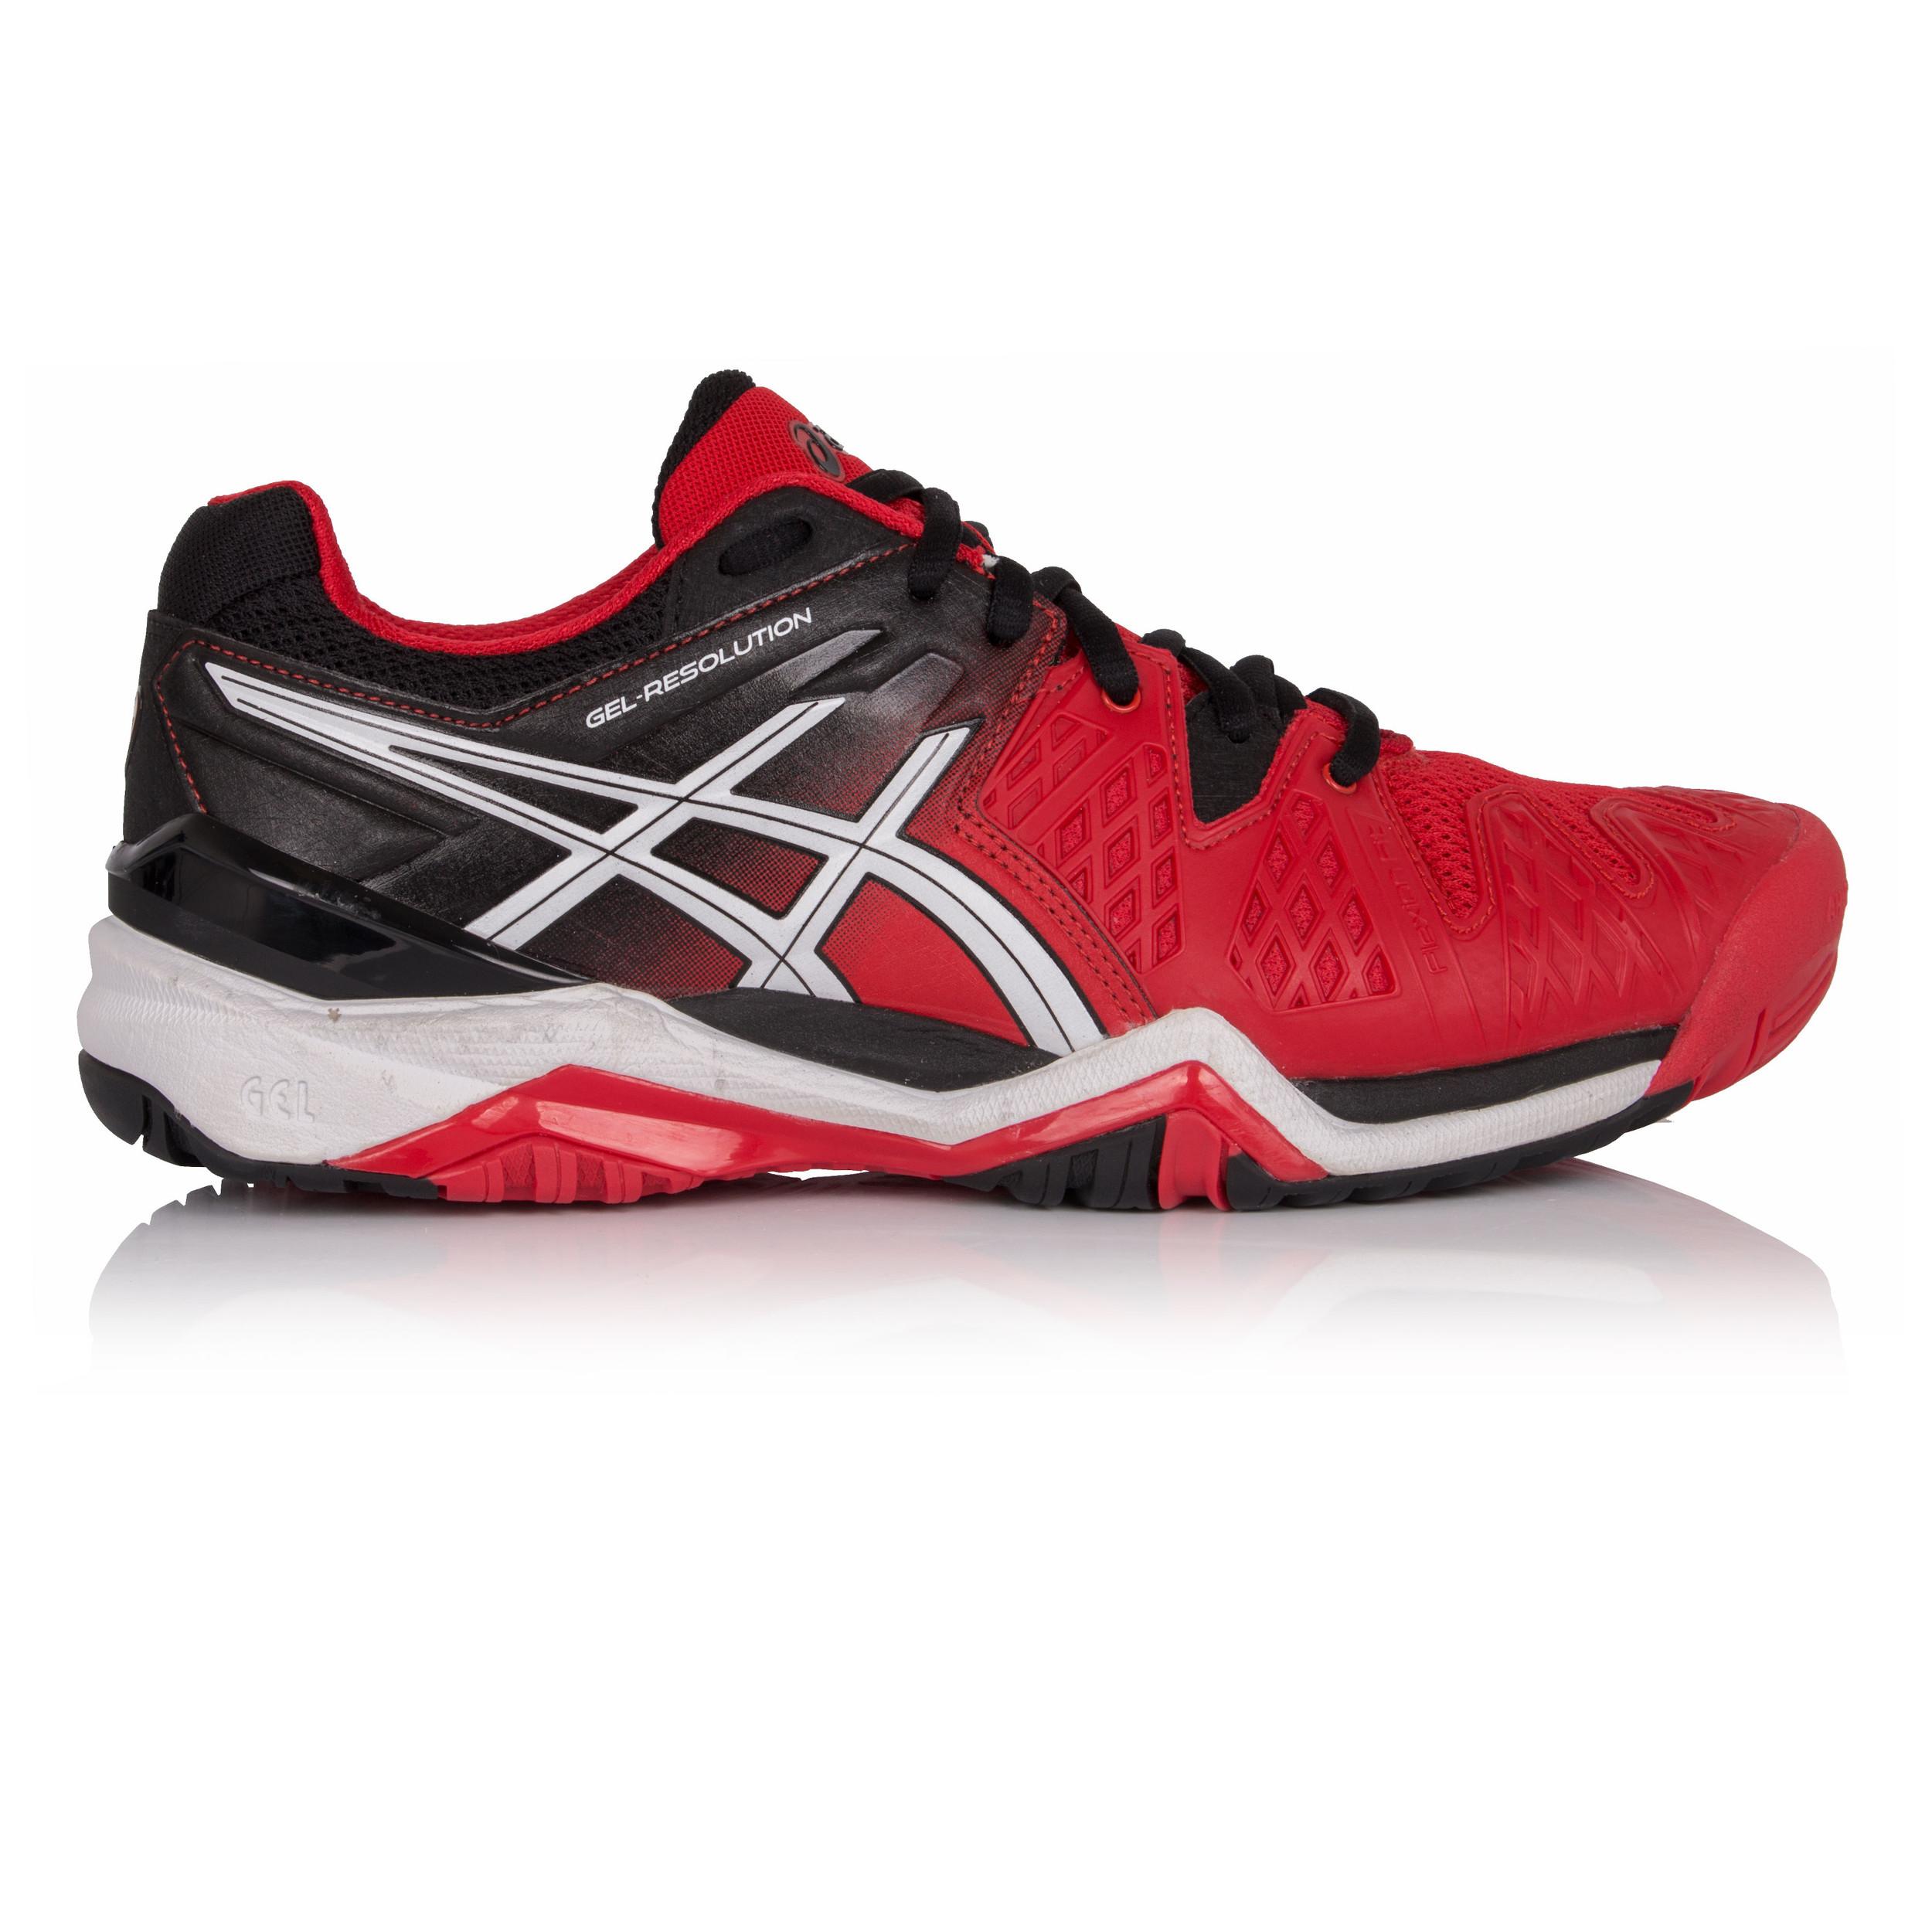 Asics Gel Resolution 6 Uomo Rosso Nero Tennis Scarpe da Ginnastica Sport